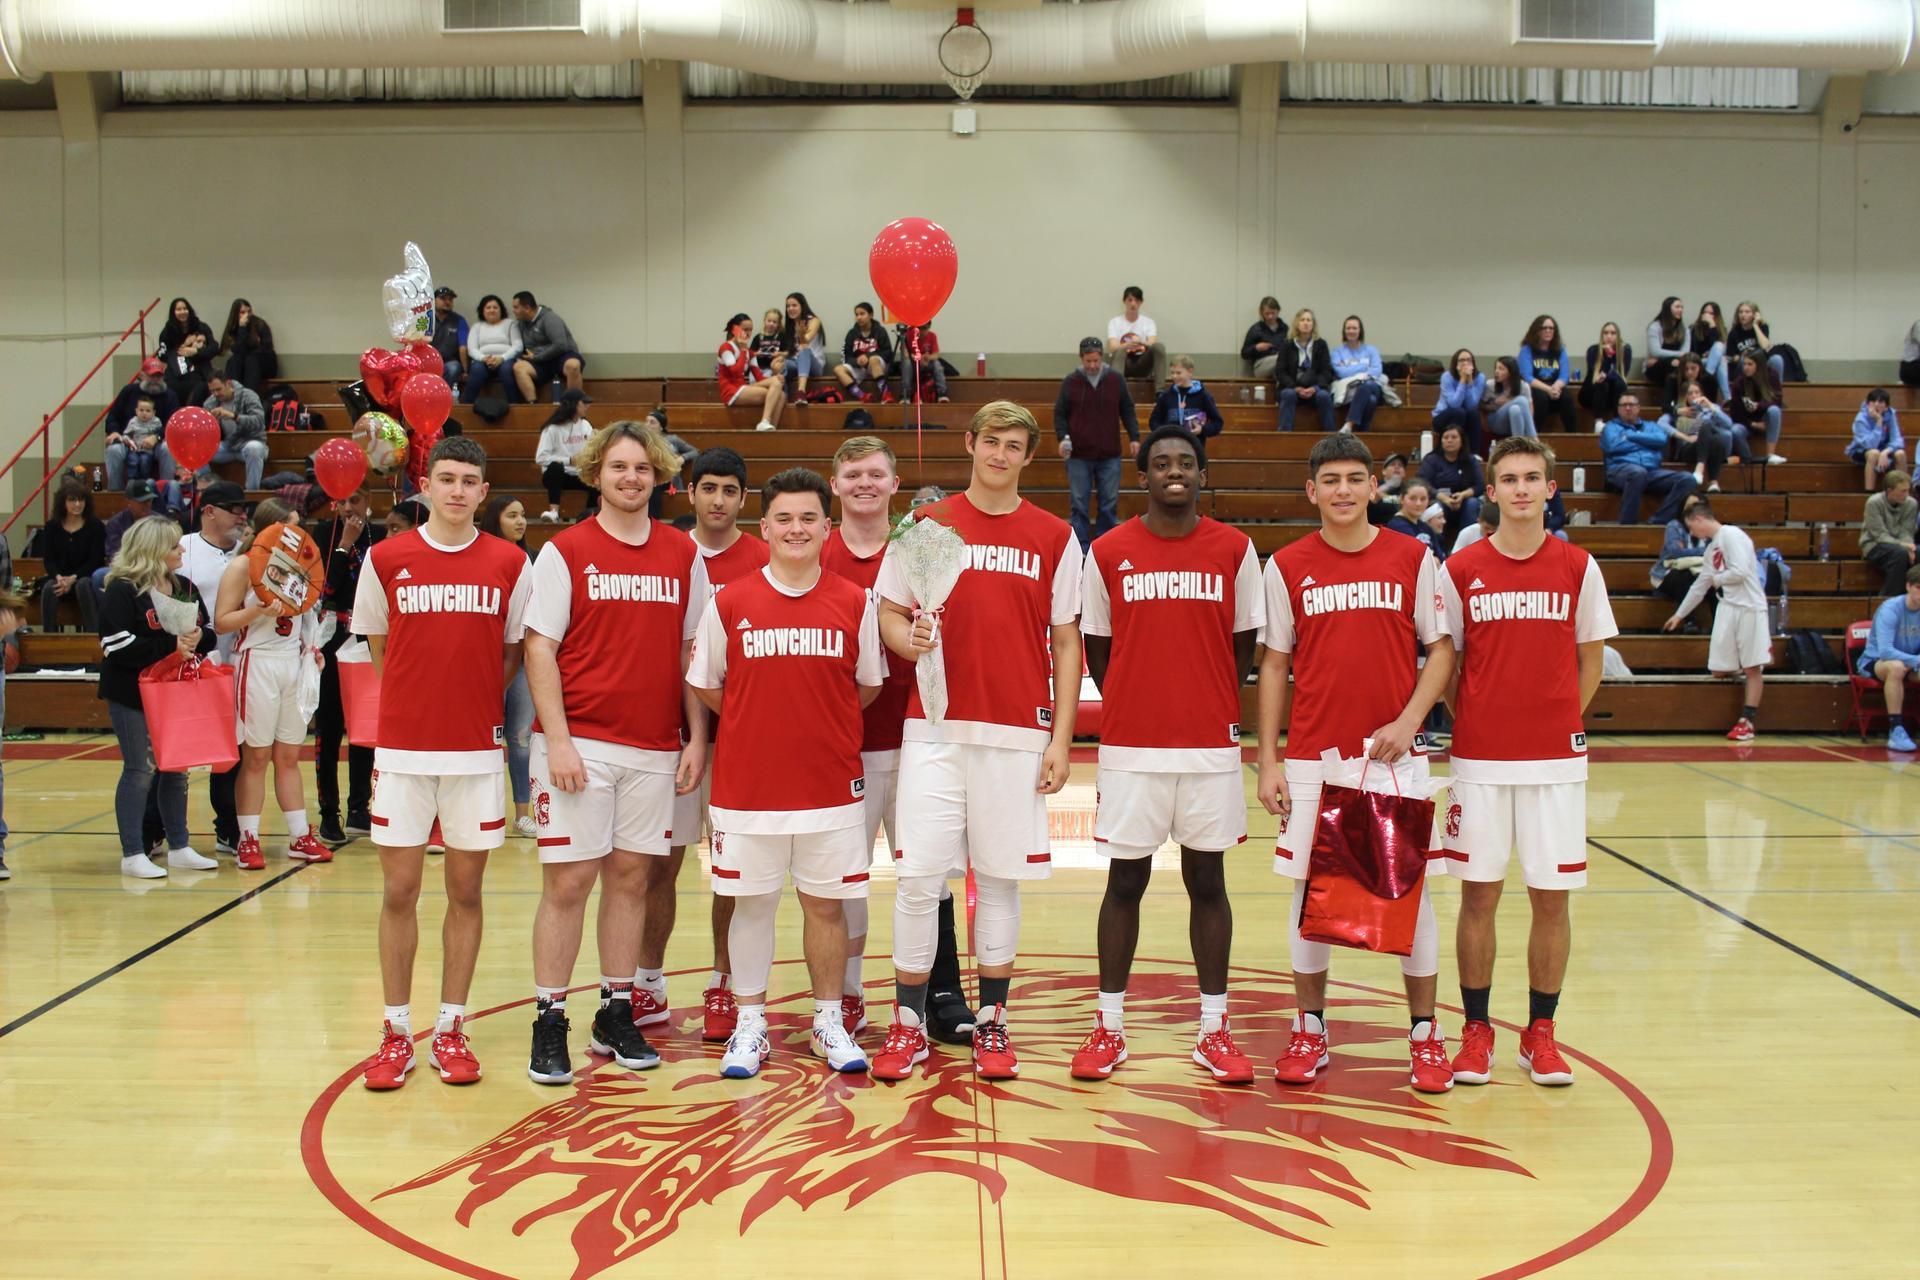 2020 Boys Basketball Seniors and teammates